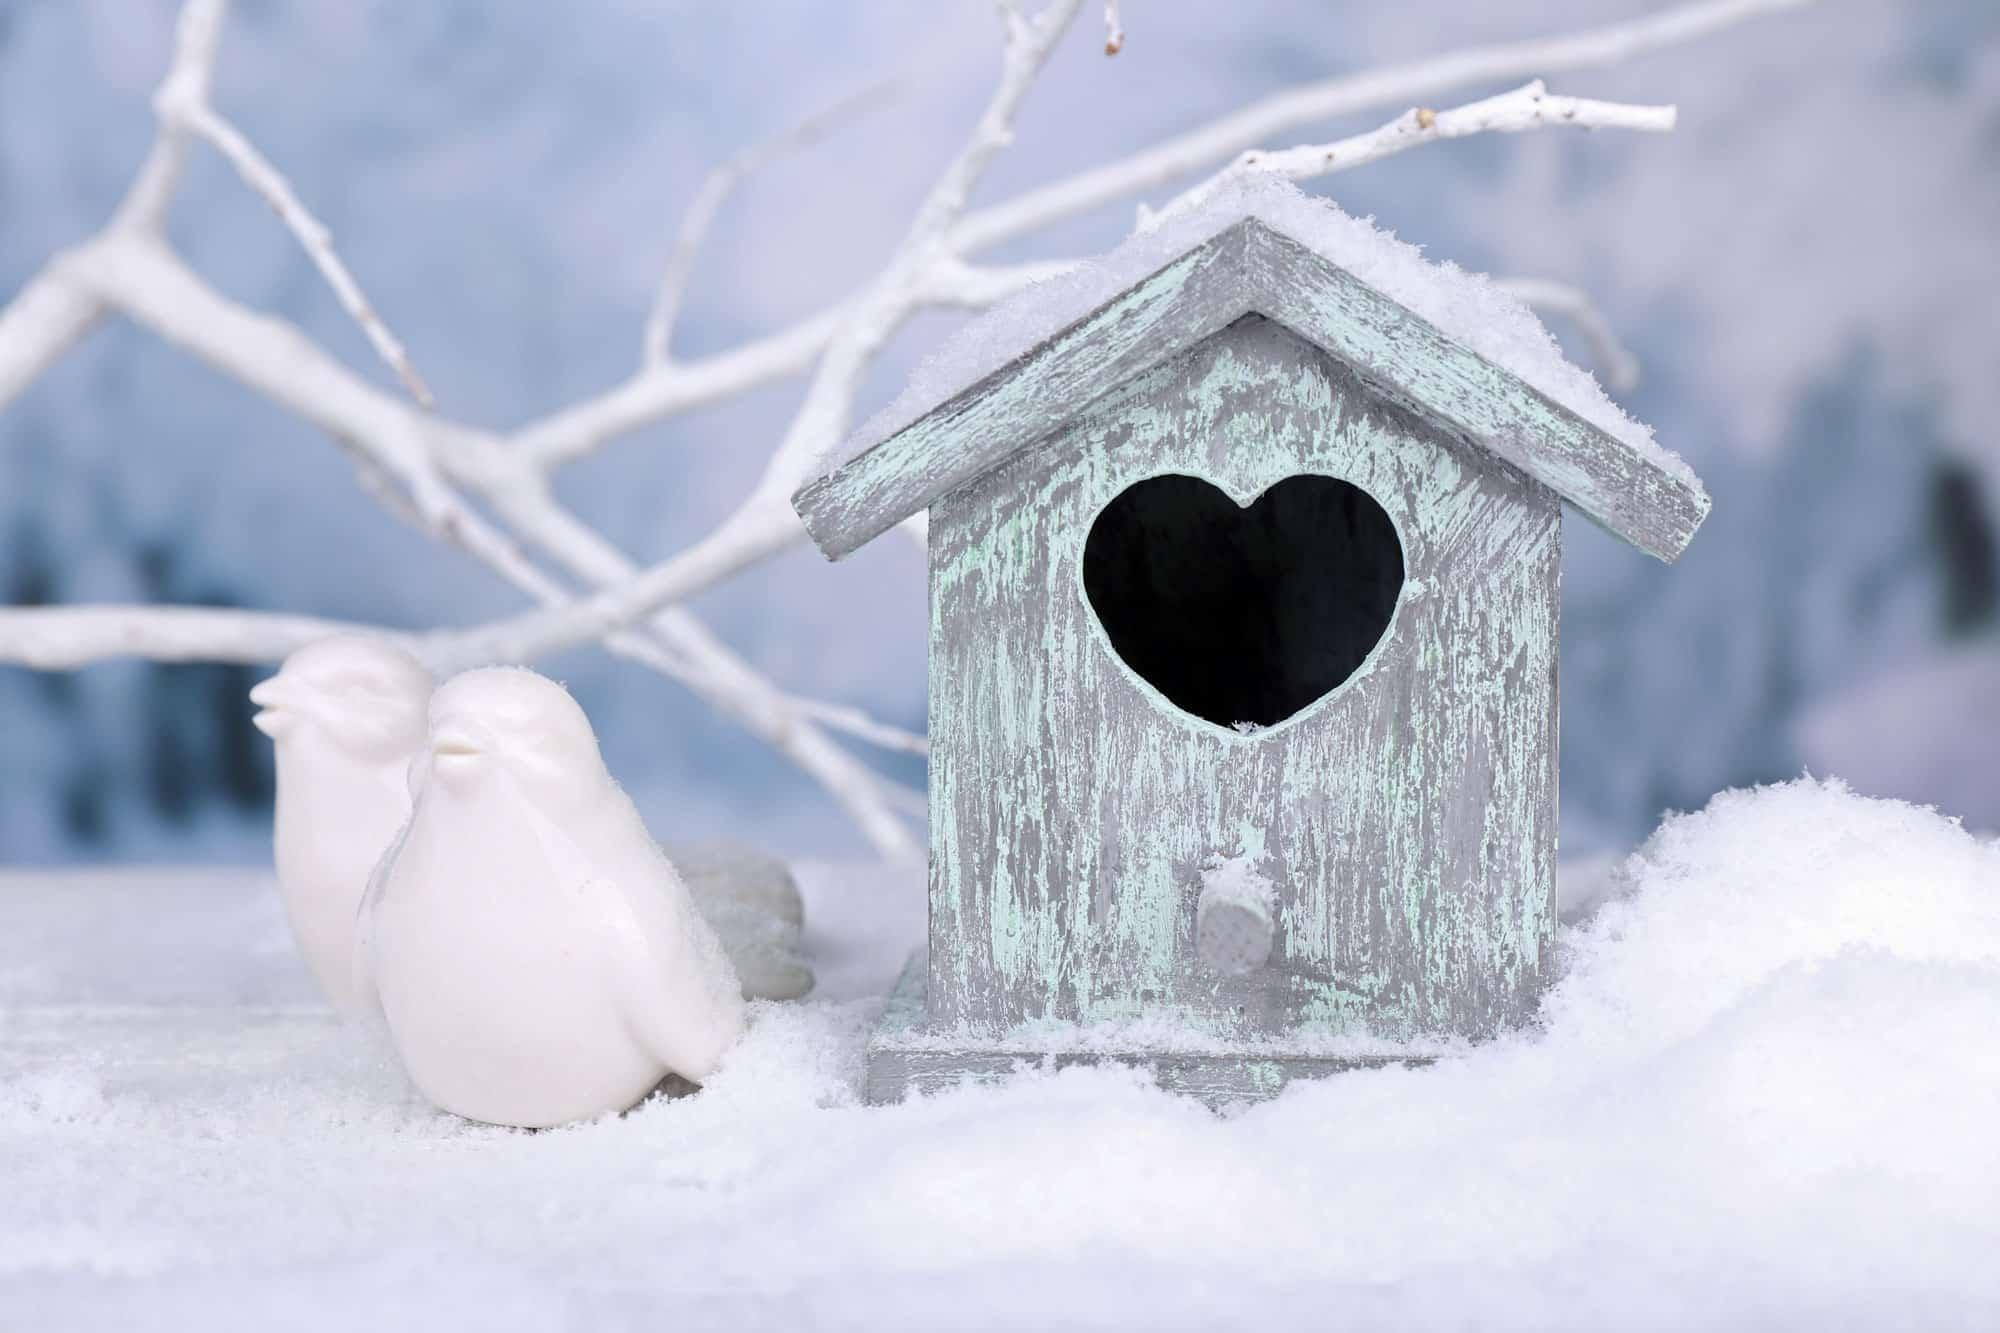 snowy scene of a bird house and ceramic birds